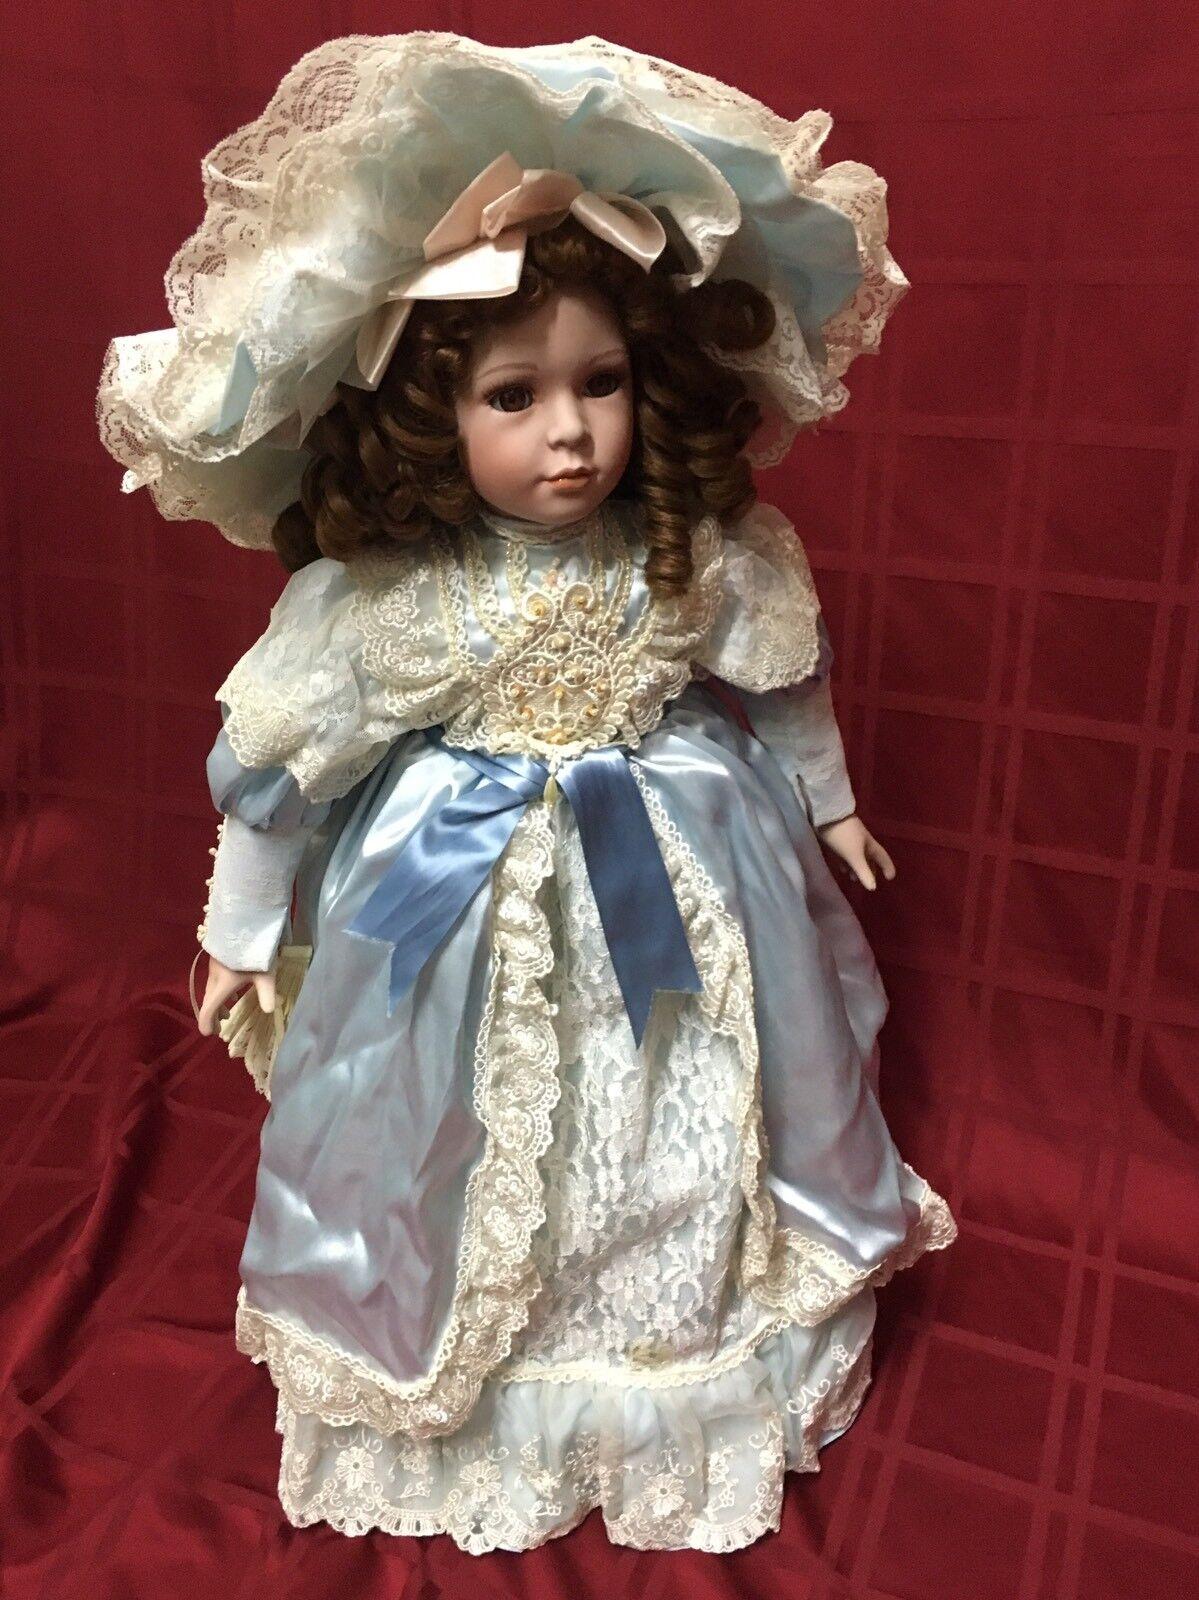 William Tung 1997 230 1500 27  Porcelain Doll Dress Silky Blau Weiß Lace Dress